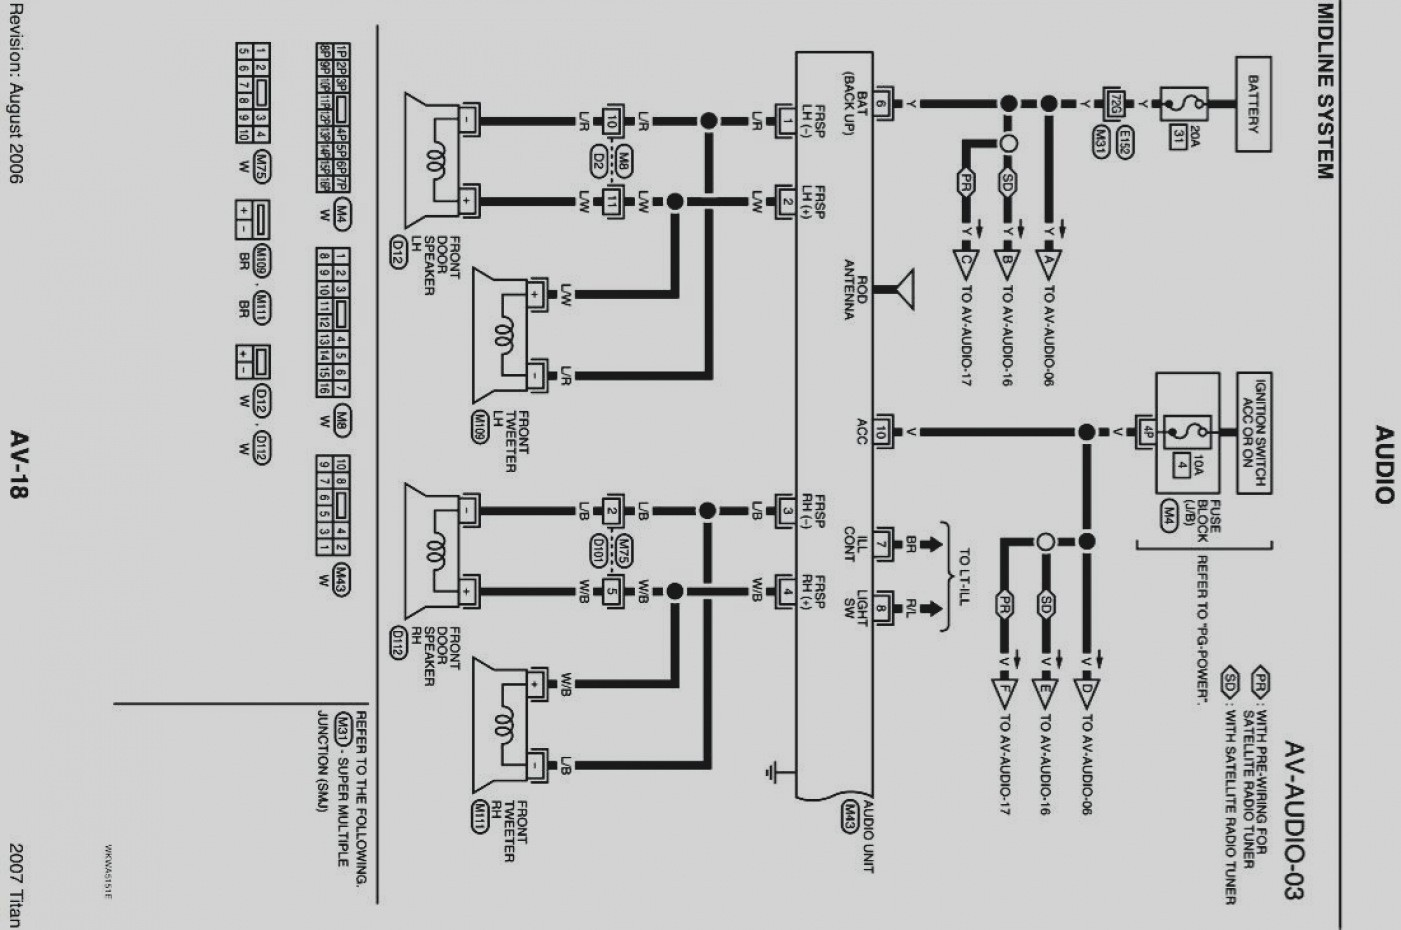 Trailer Wiring Diagram 2004 Nissan Armada Trusted Dodge Caravan Headlight Harness Titan Block And Schematic Grand